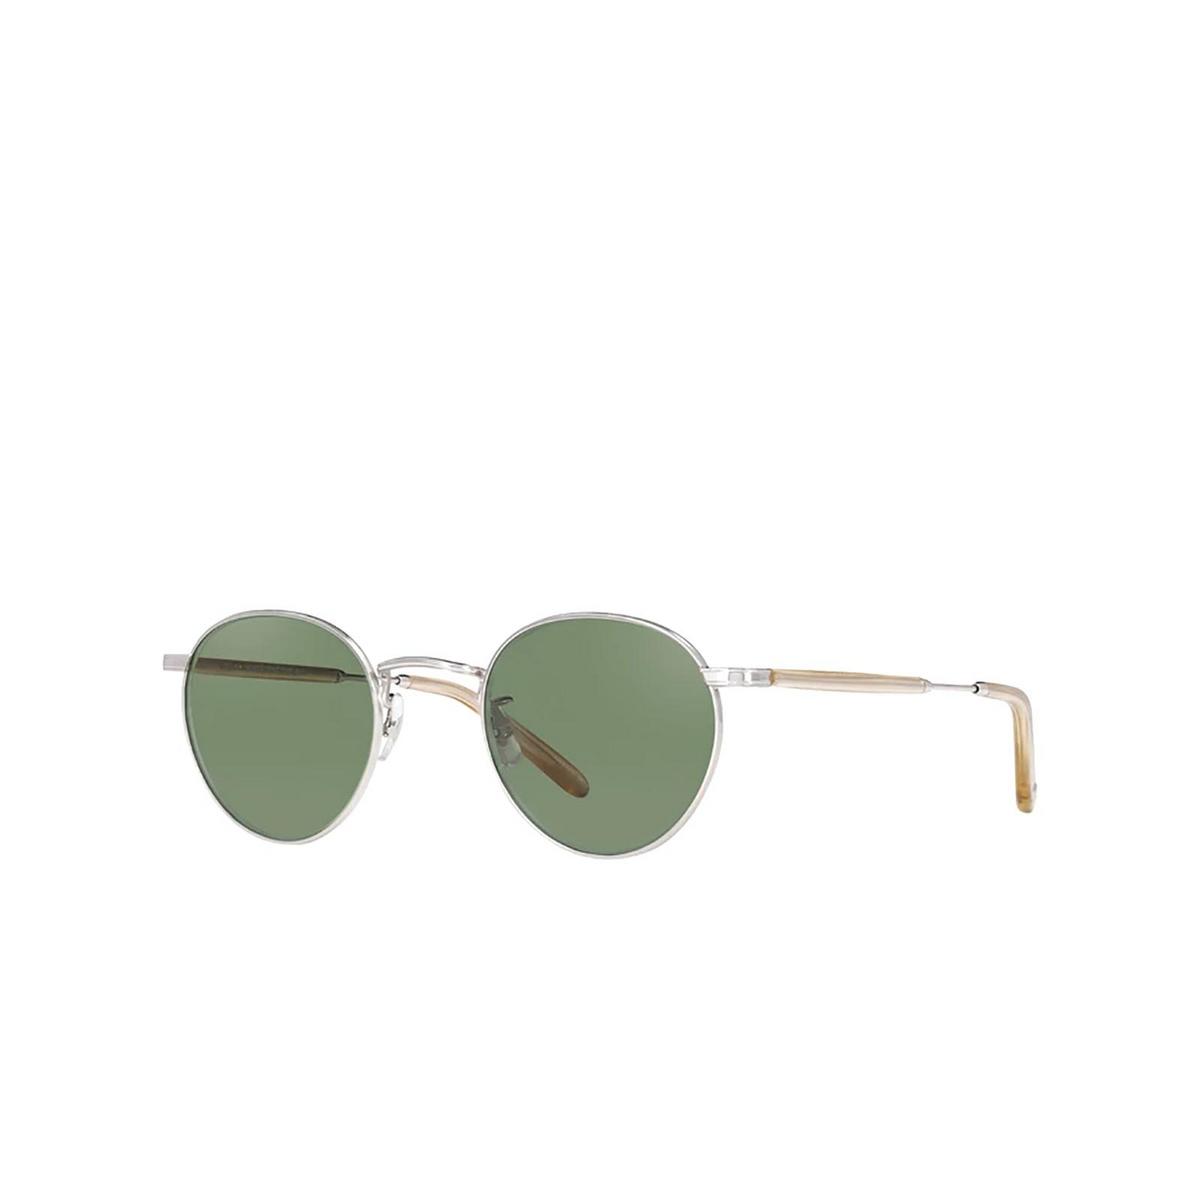 Garrett Leight® Round Sunglasses: Wilson M Sun color Silver Blonde S-b/sfgrn.